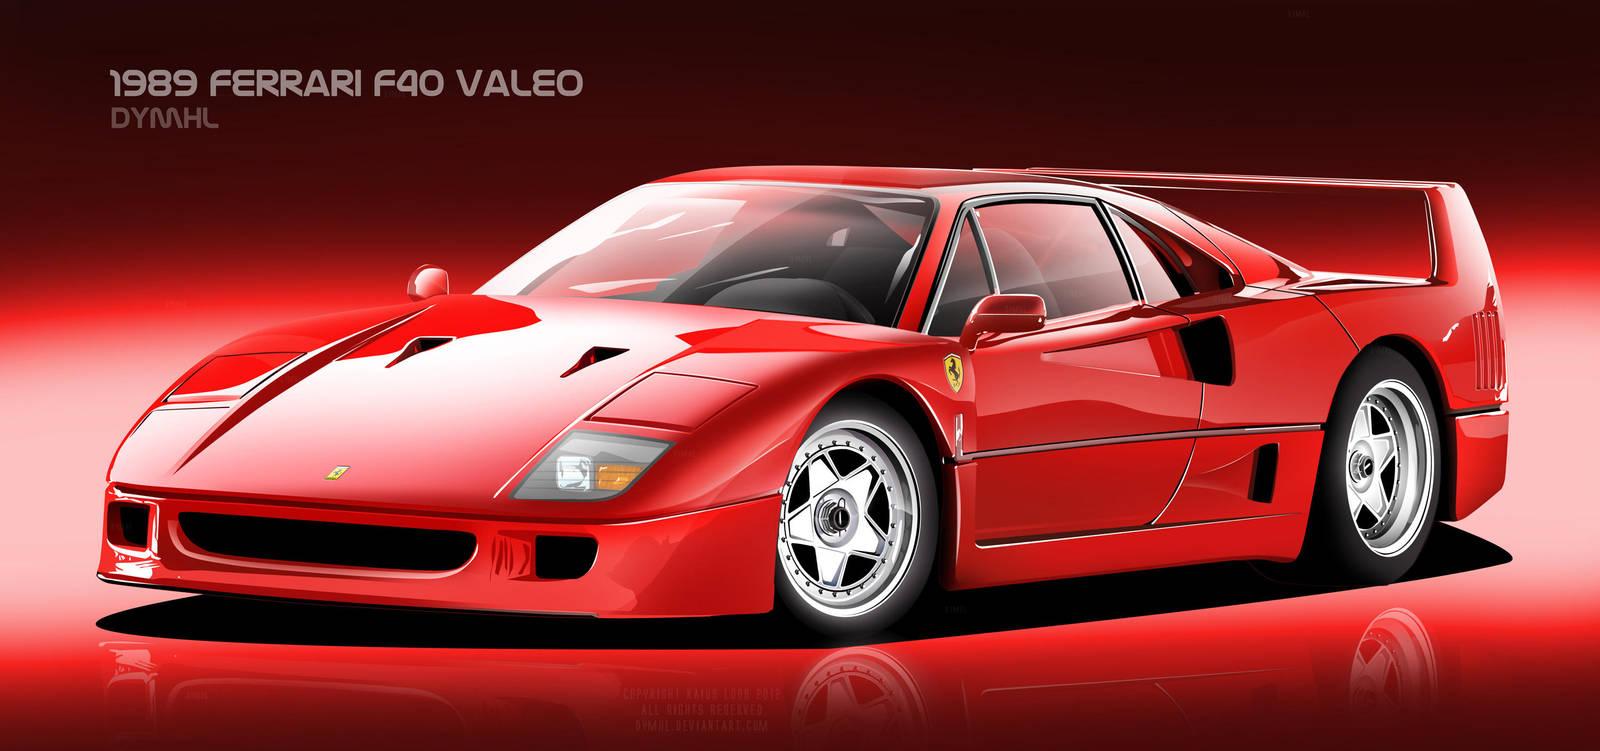 Ferrari F40 Valeo by DyMHL